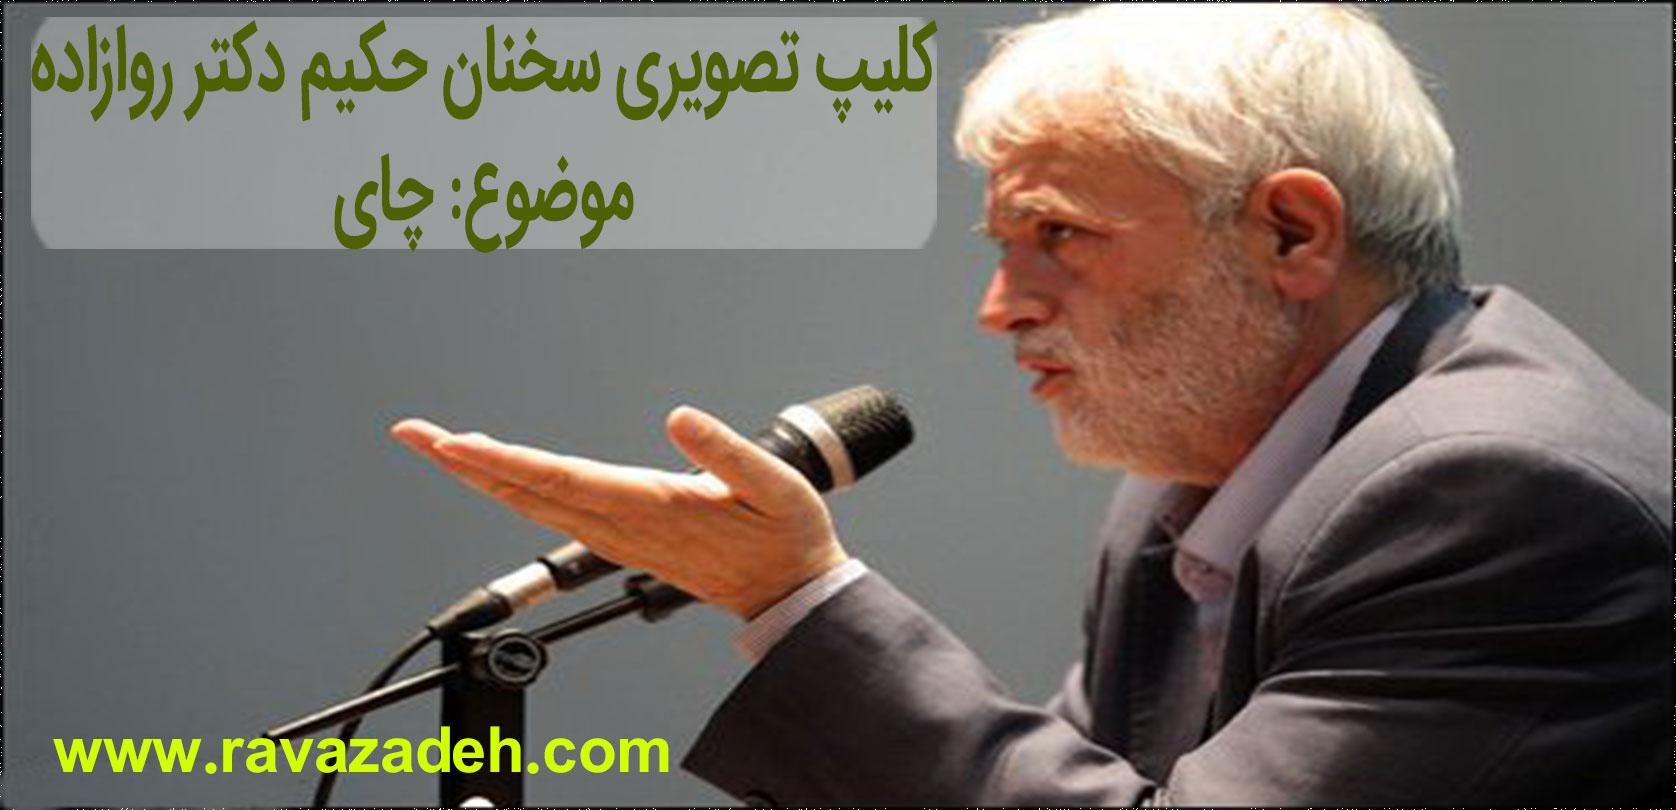 Photo of چای + کلیپ تصویری سخنرانی حکیم دکتر روازاده